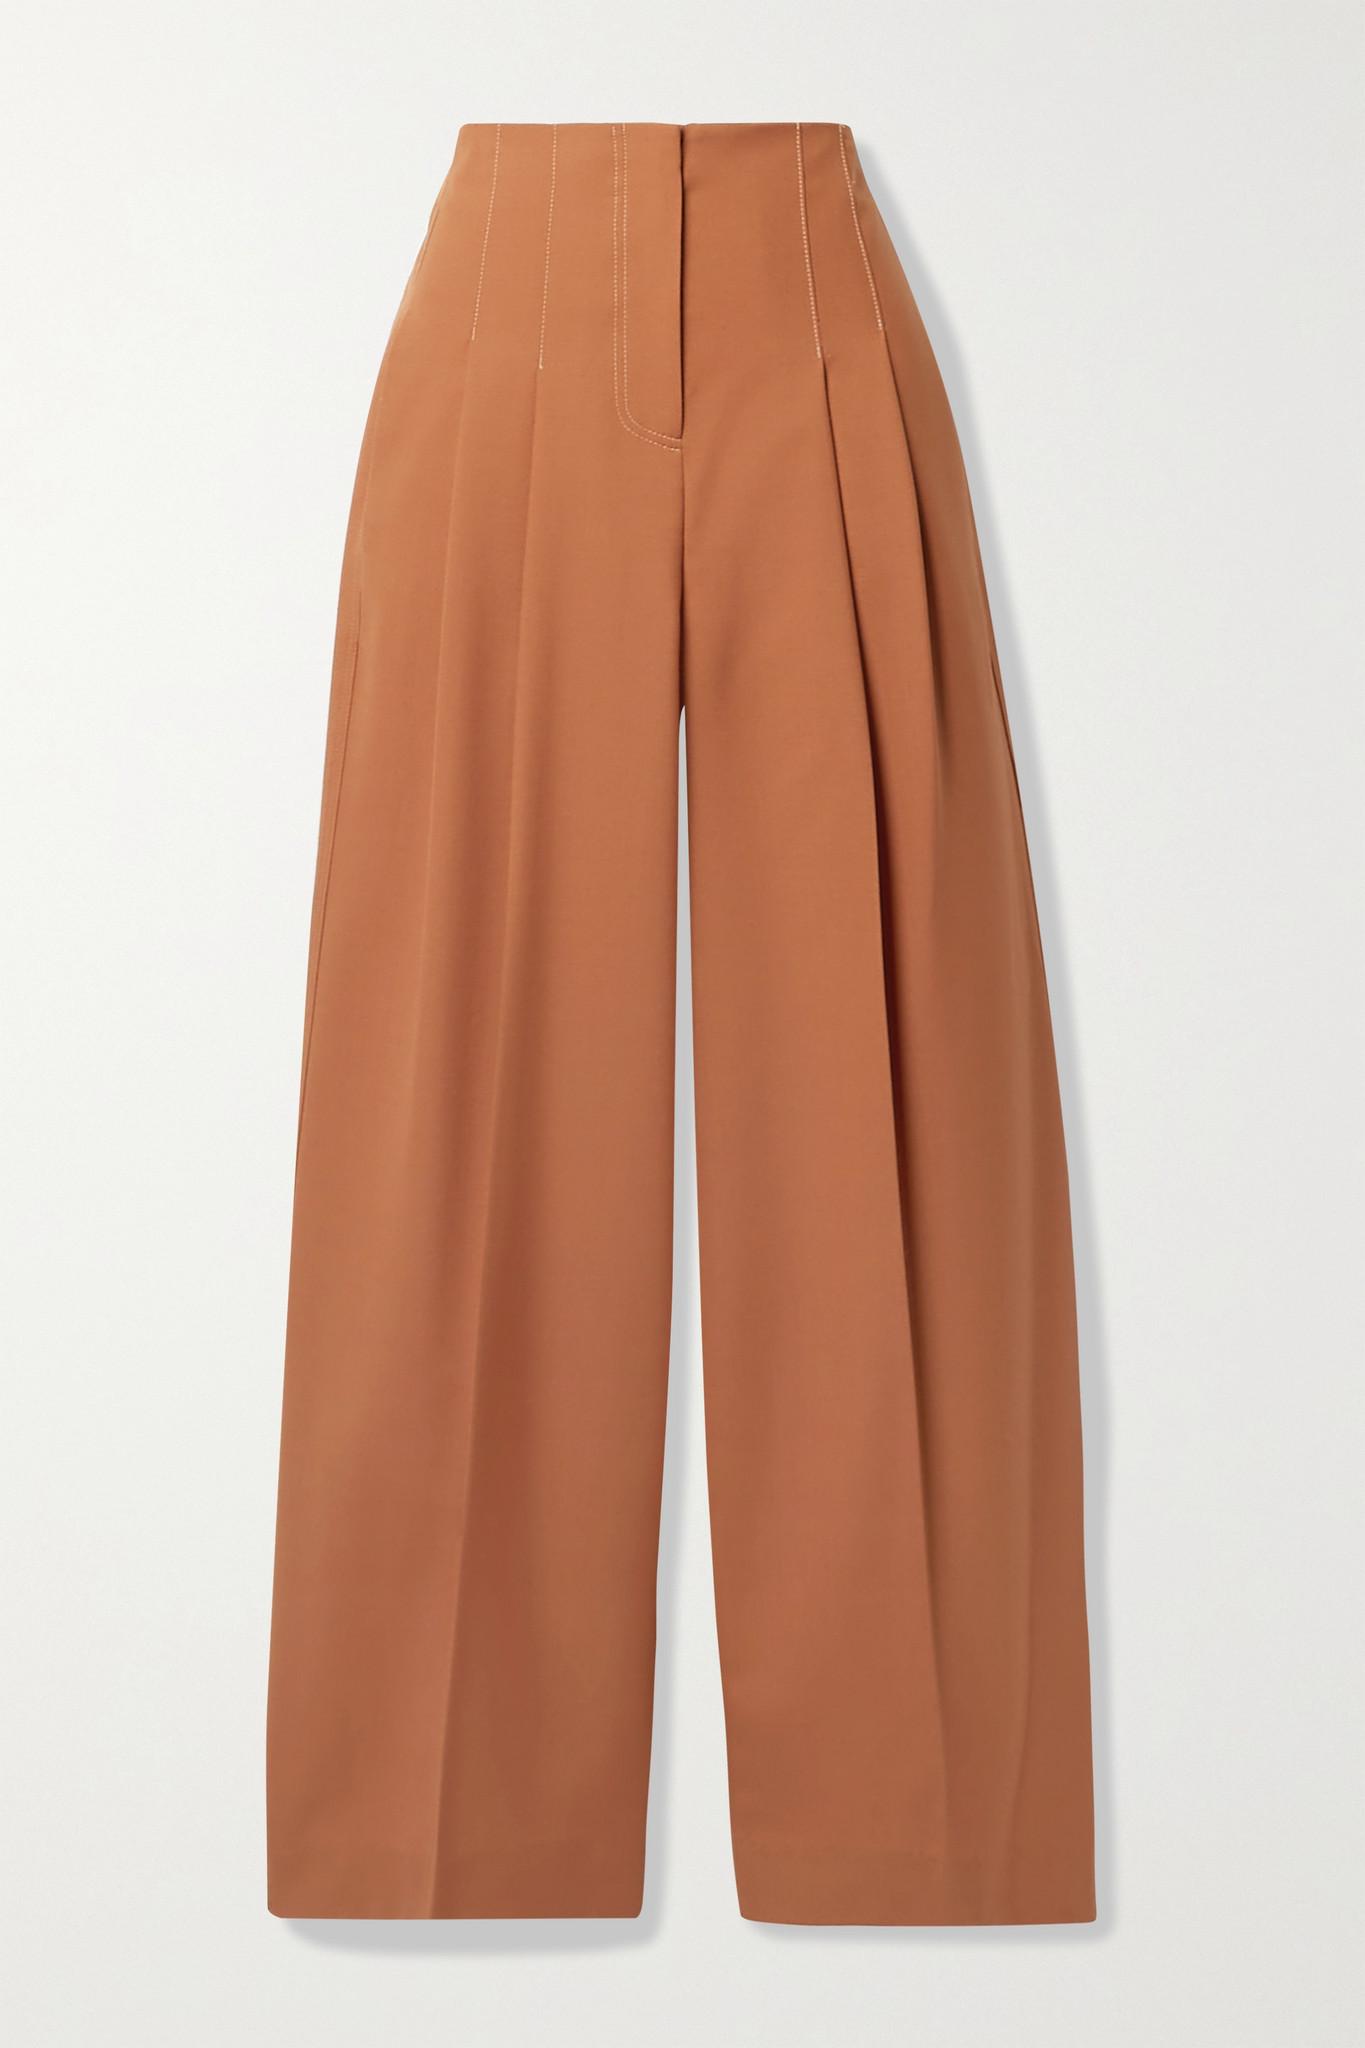 LVIR - 褶裥羊毛混纺阔腿裤 - 橙色 - small